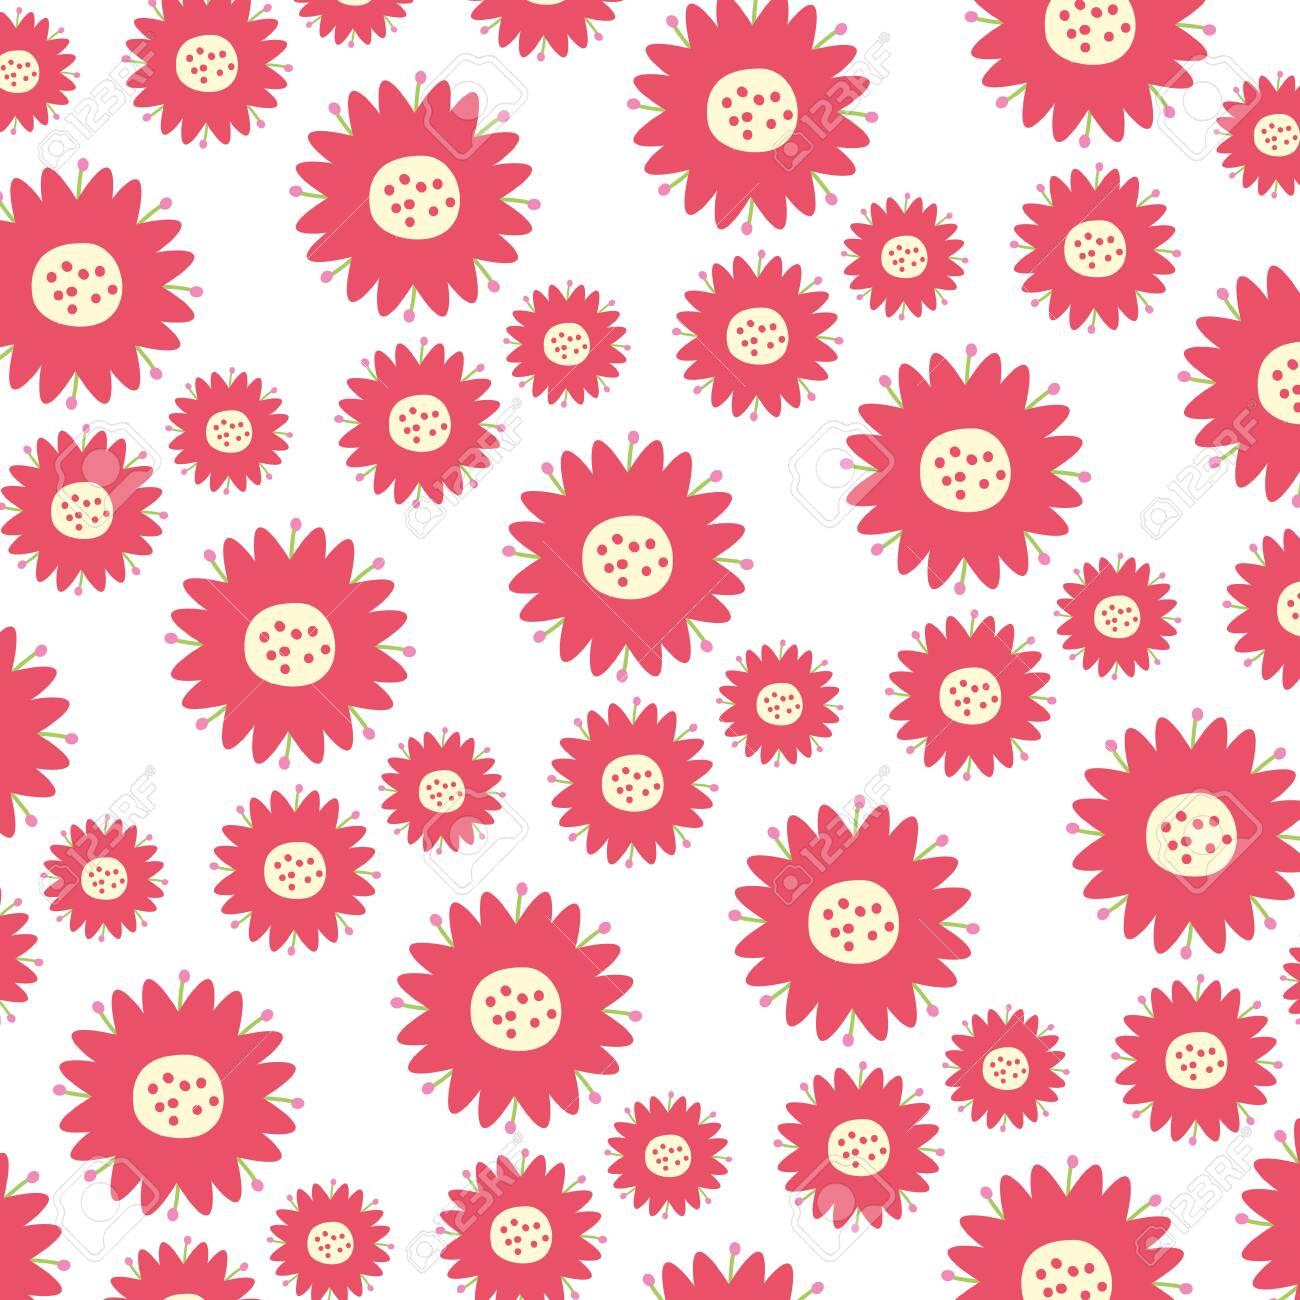 background flowers leaves natural decoration vector illustration - 124280110